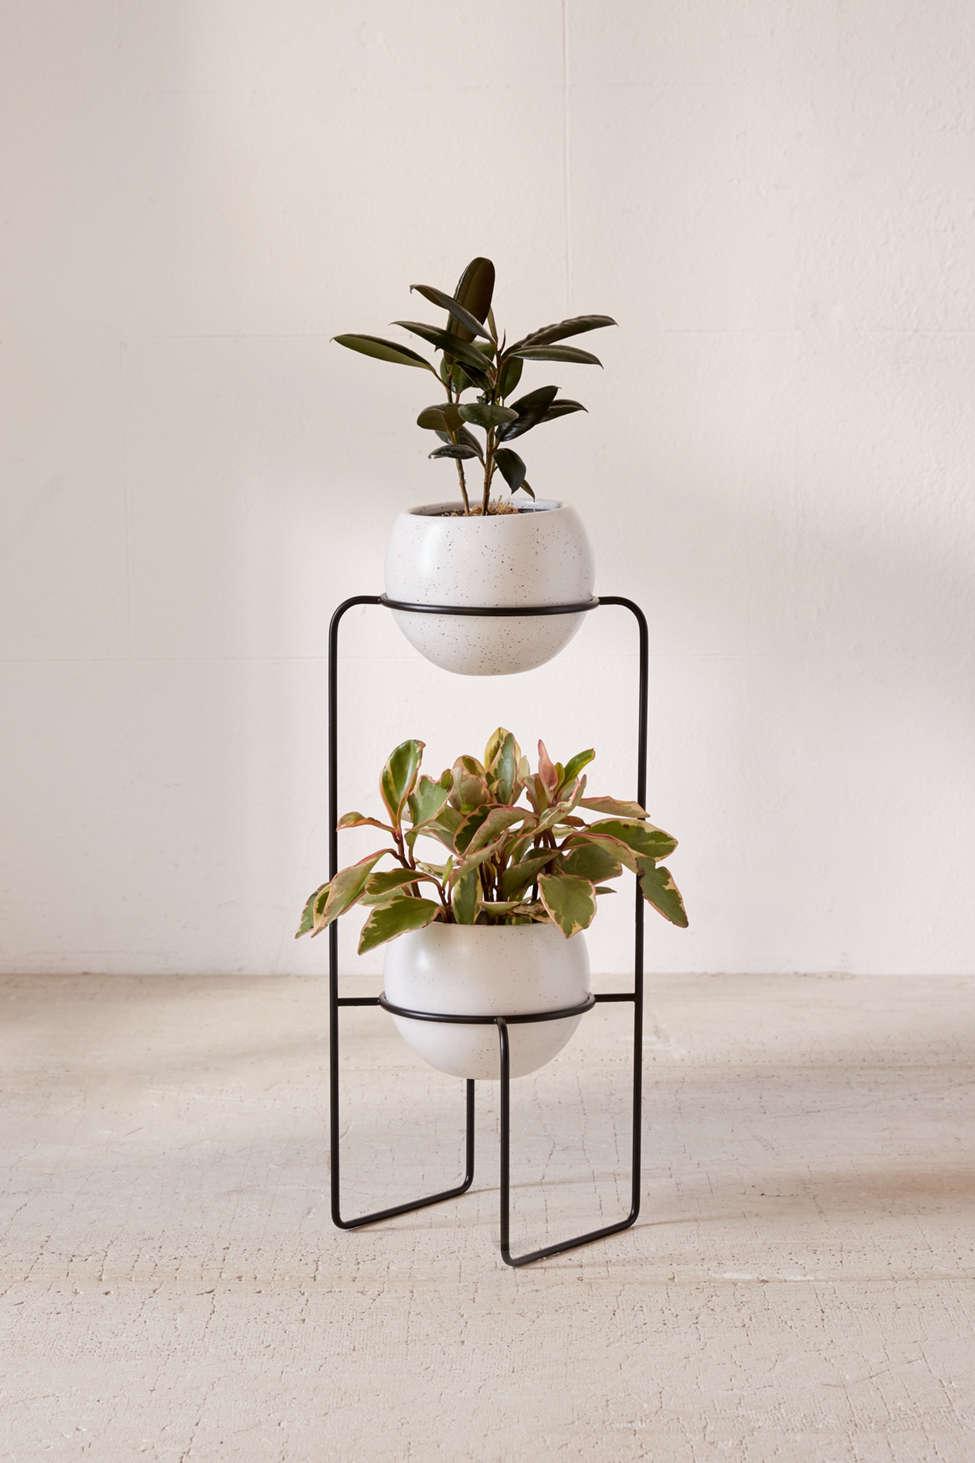 Slide View: 1: Mila Dual Standing Planter